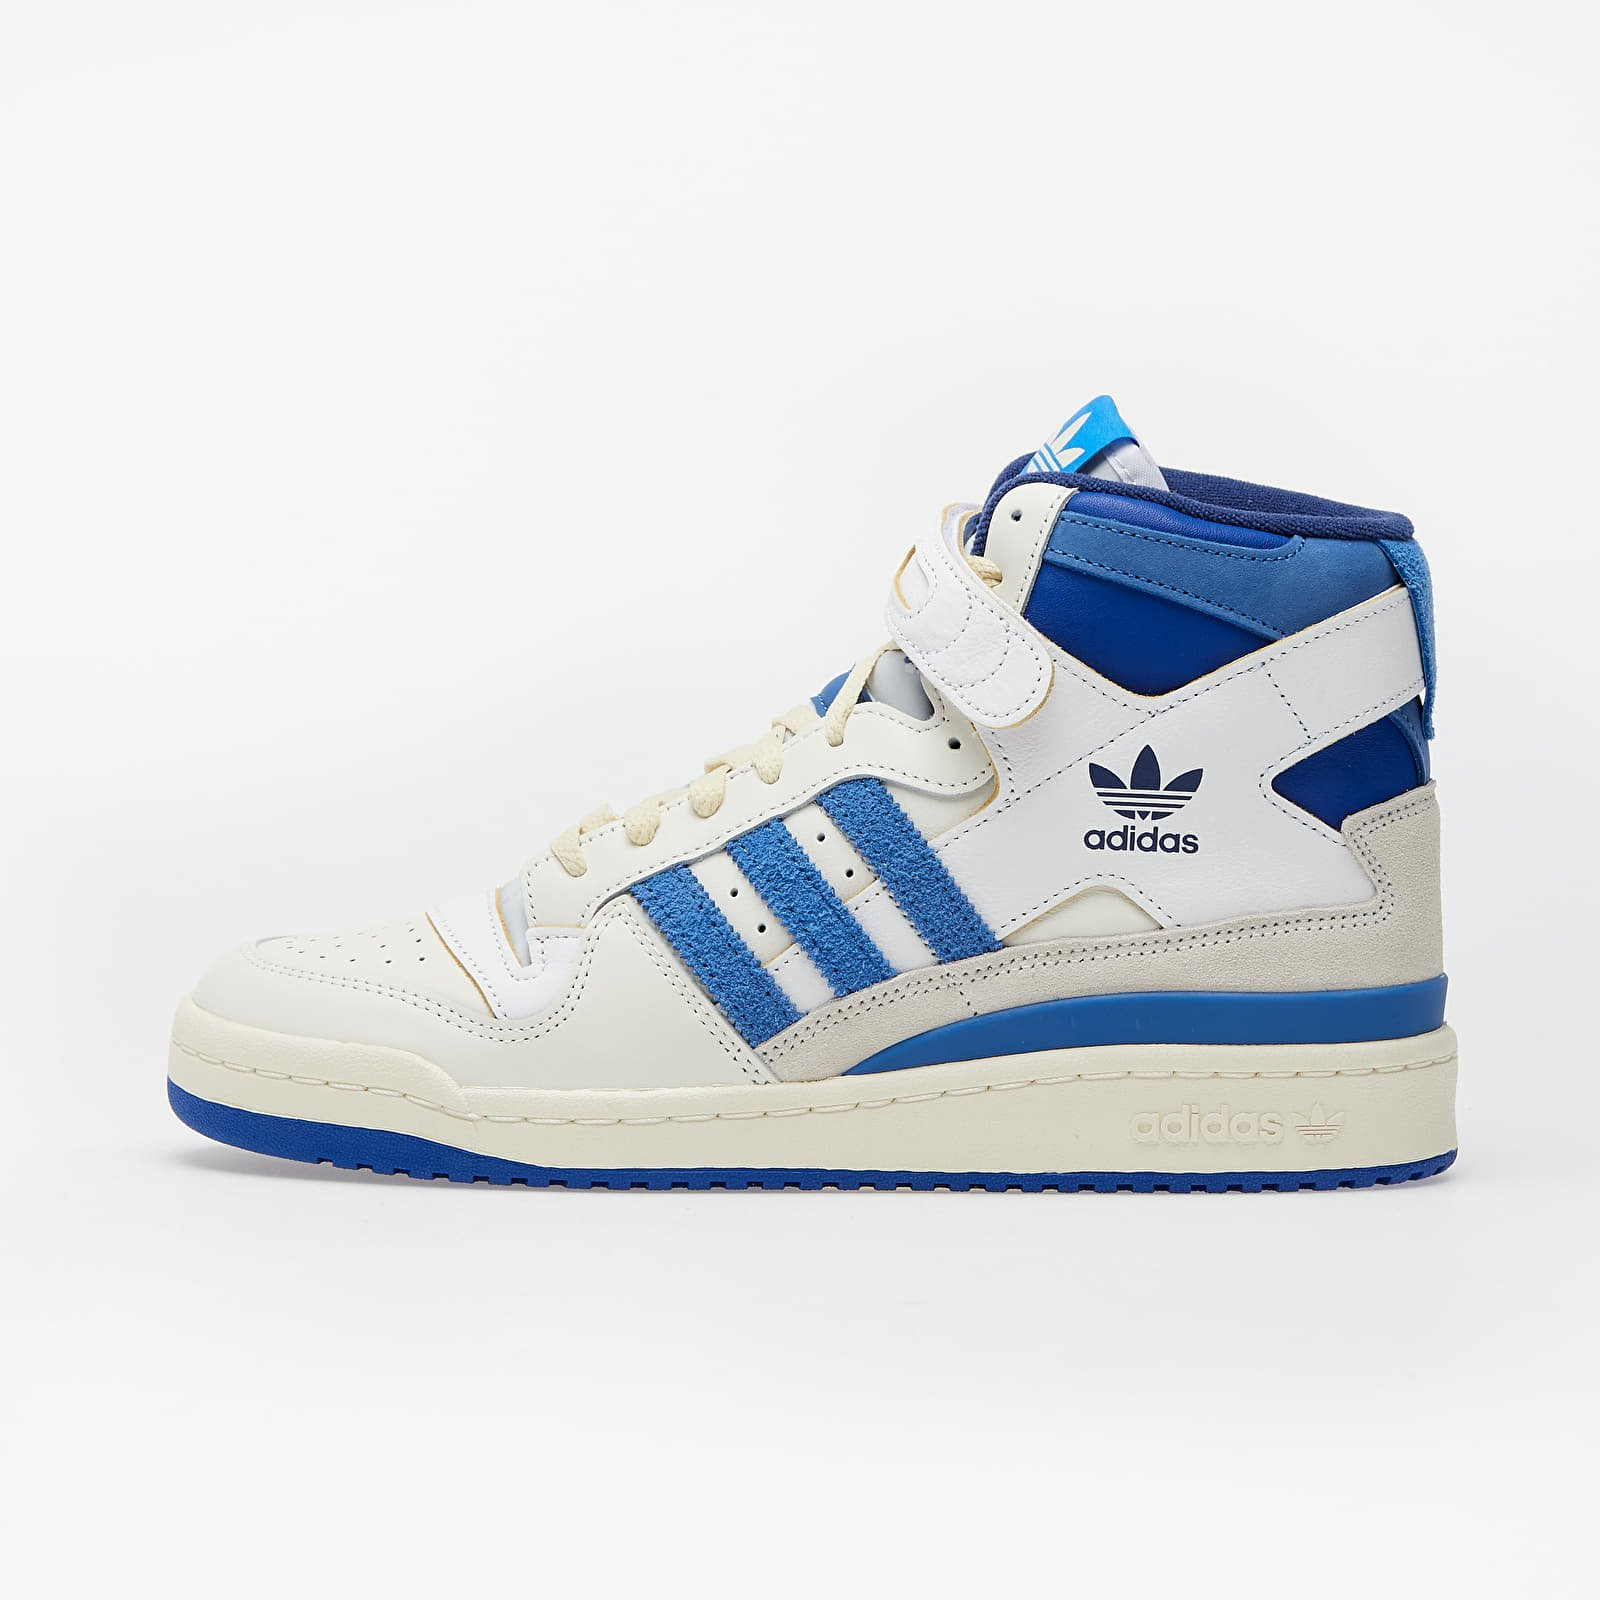 Pánské tenisky a boty adidas Forum 84 High Blue Thread Off White/ Bright Blue/ Ftwr White